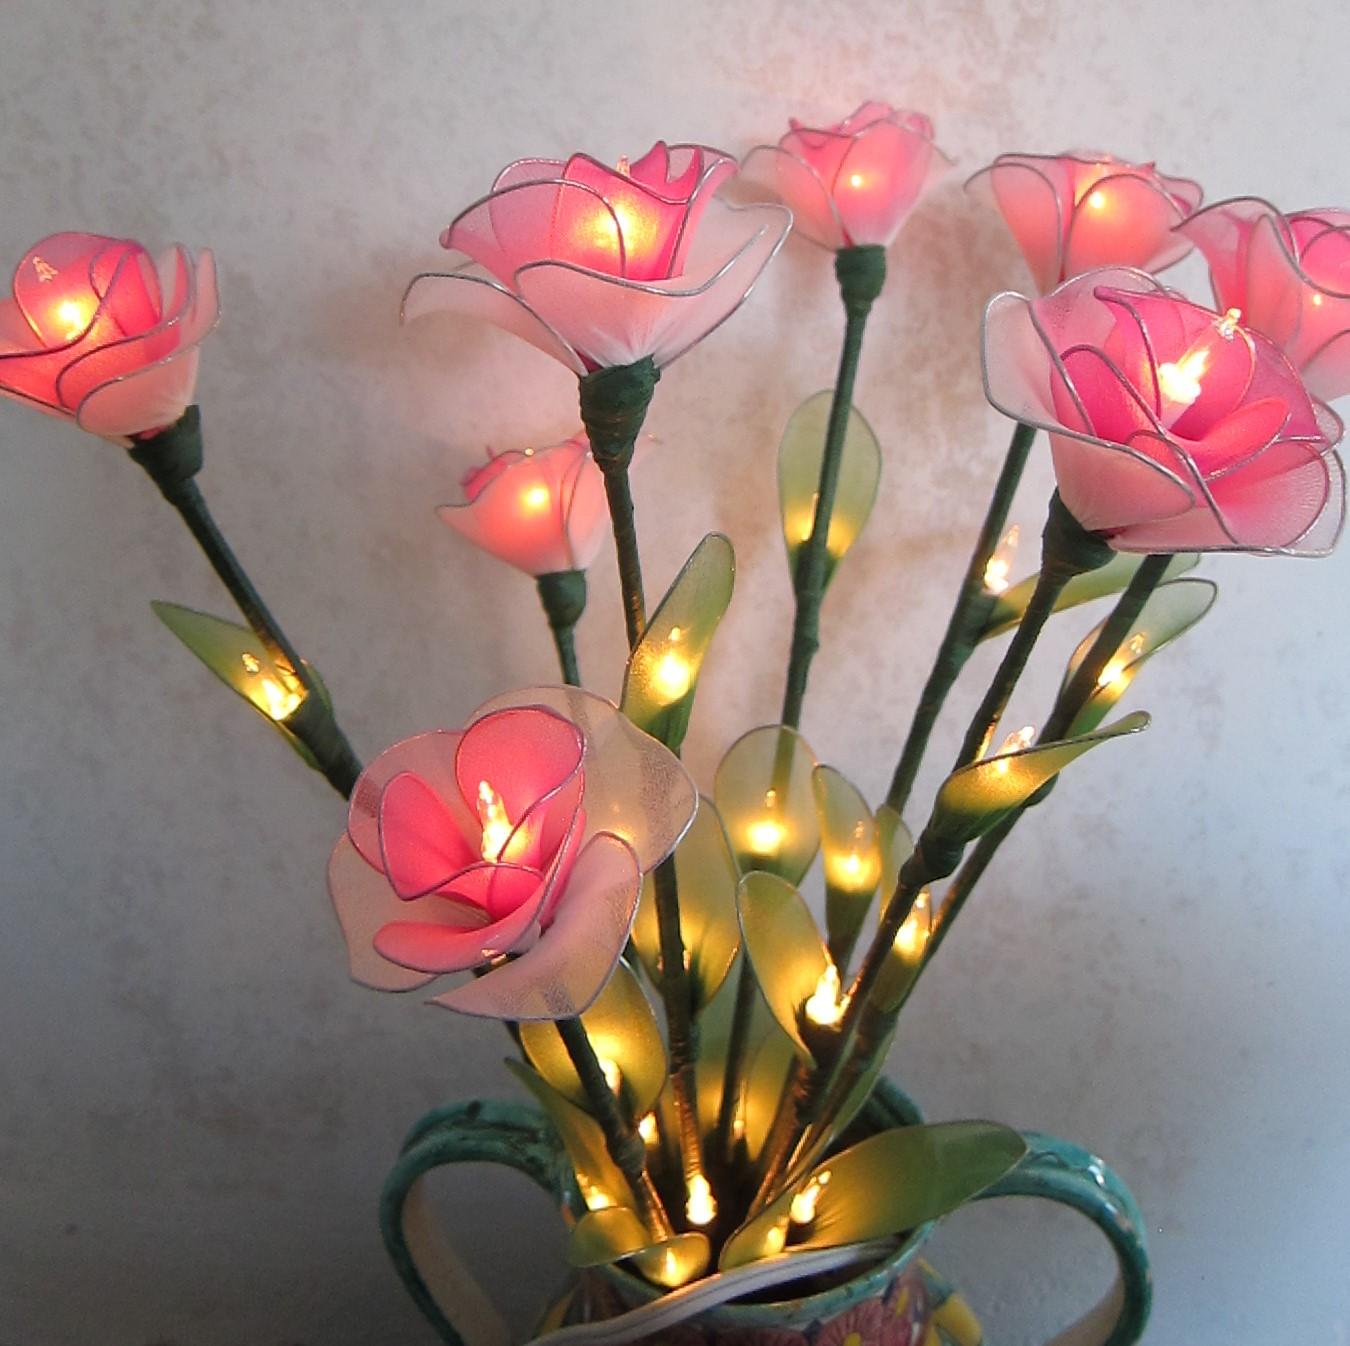 Flower Lights_4057